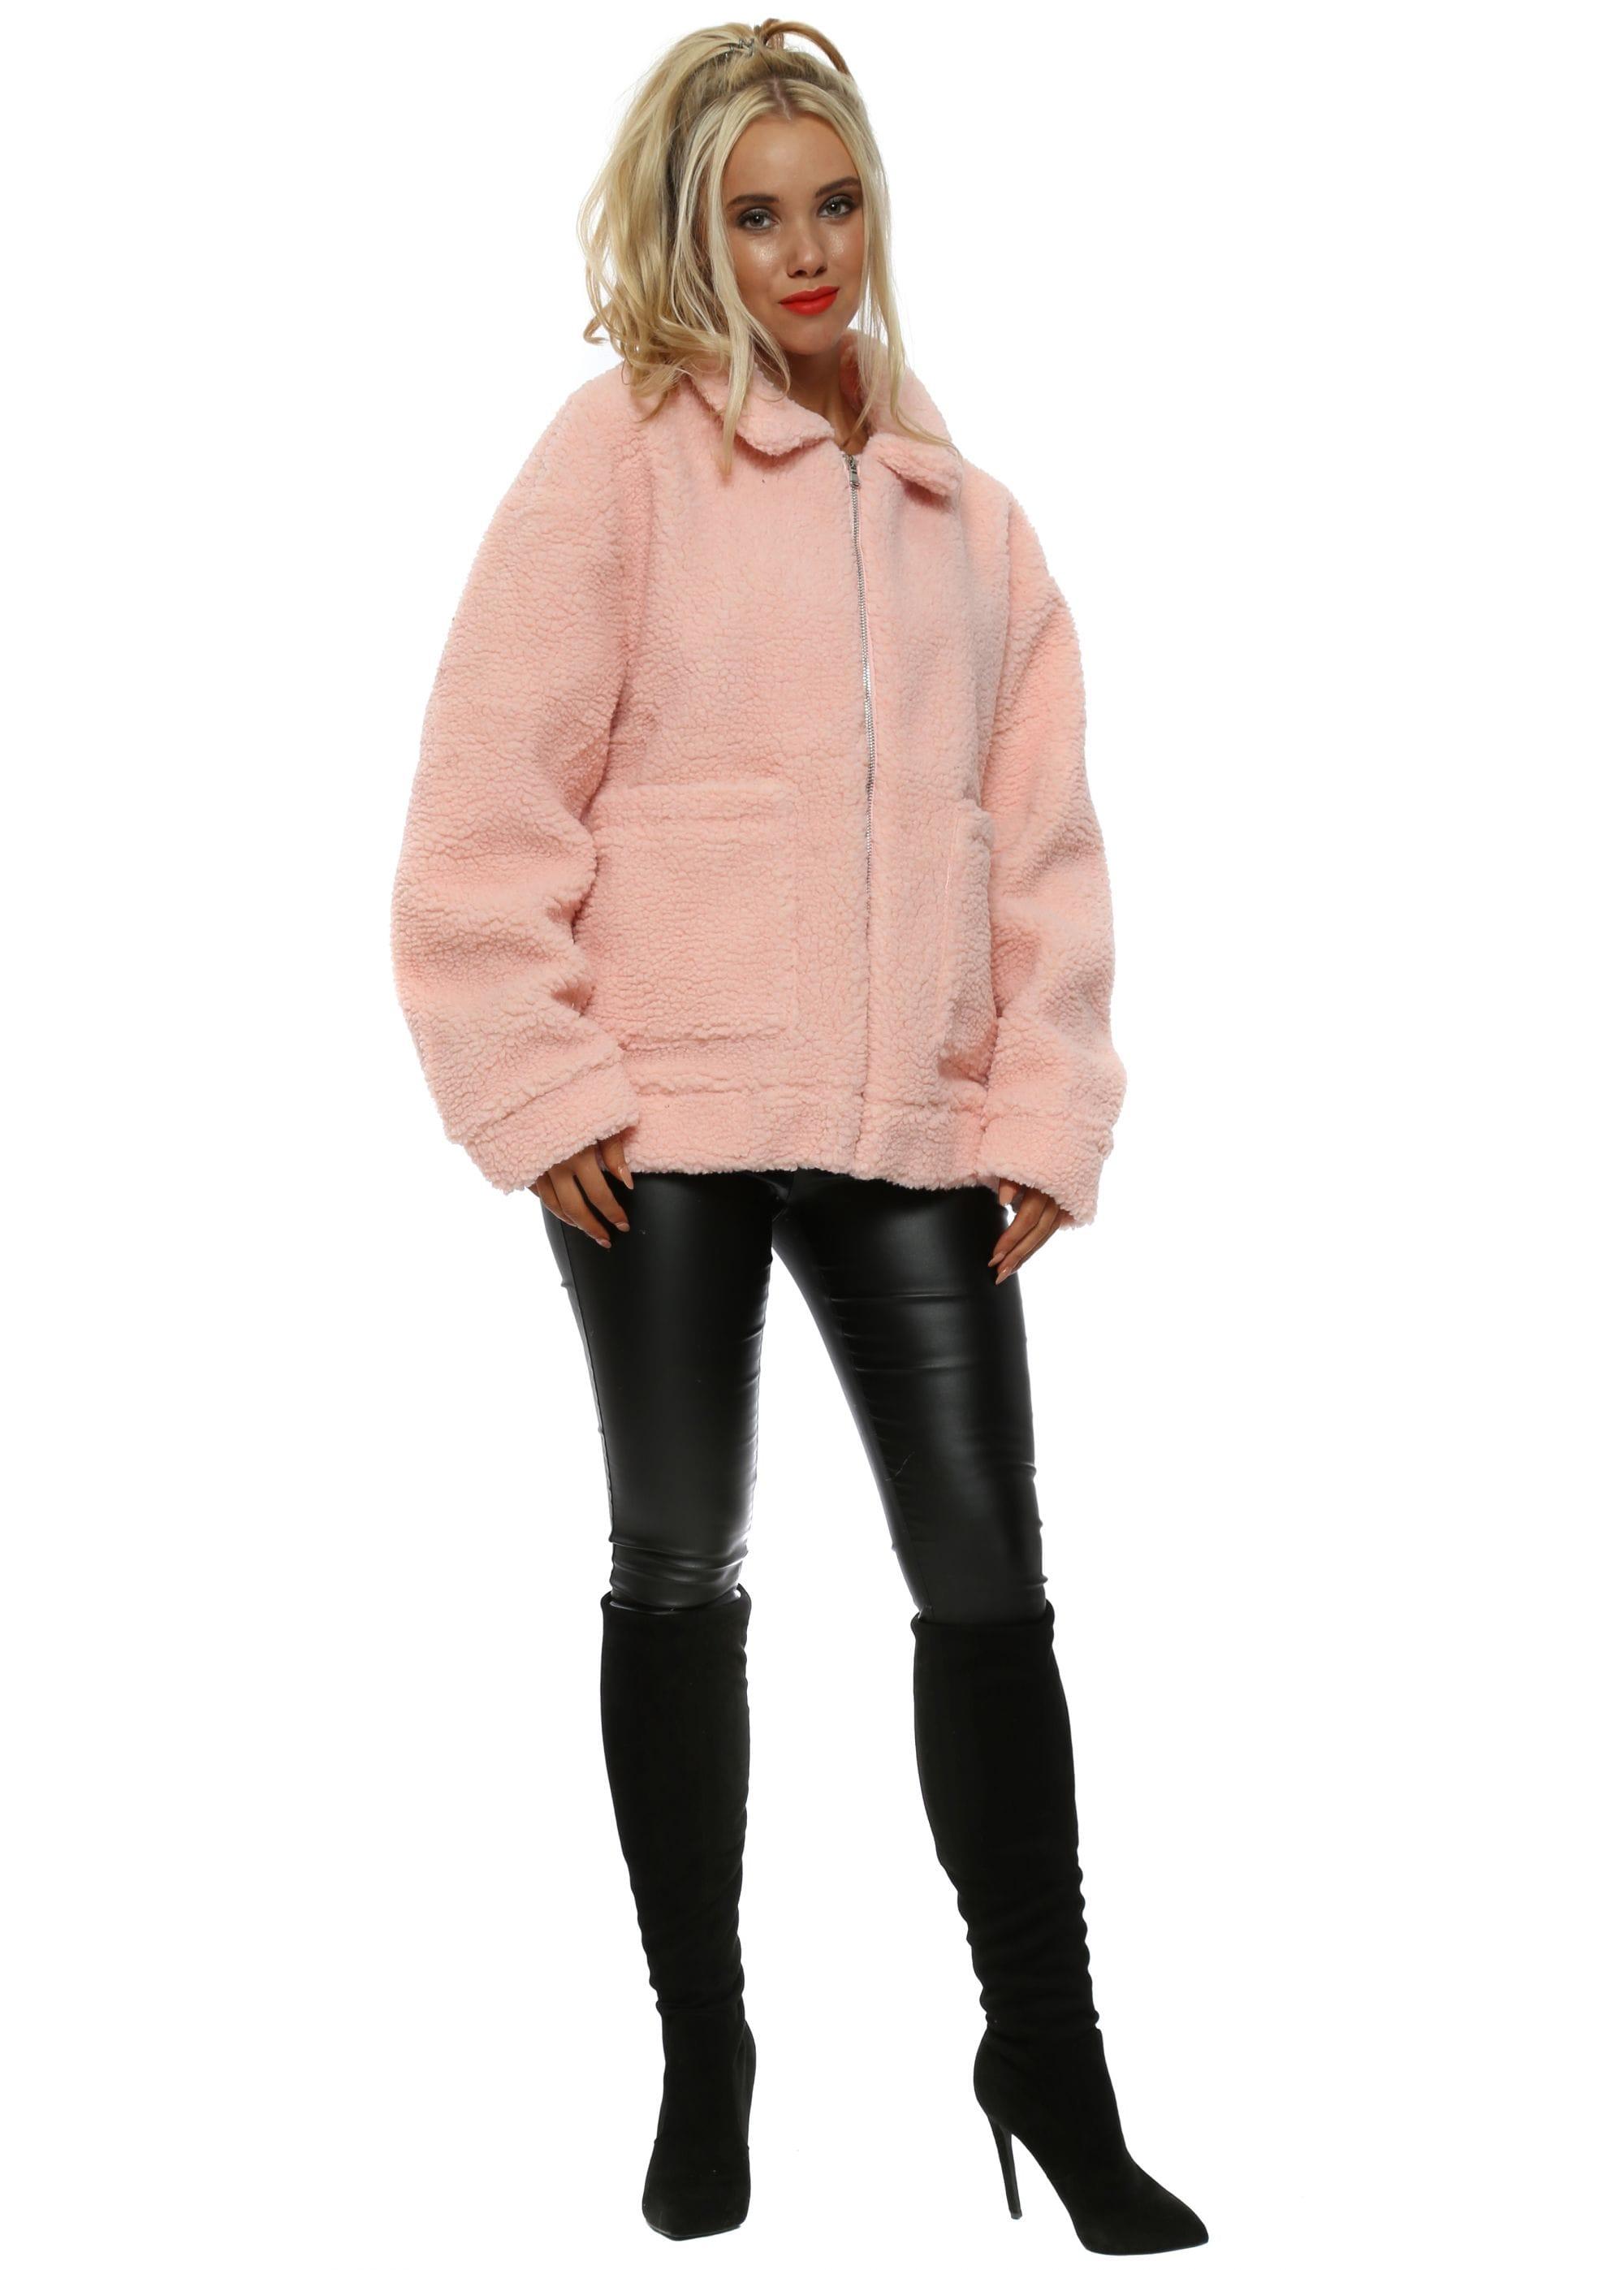 Baby Pink Oversized Teddy Bear Jacket